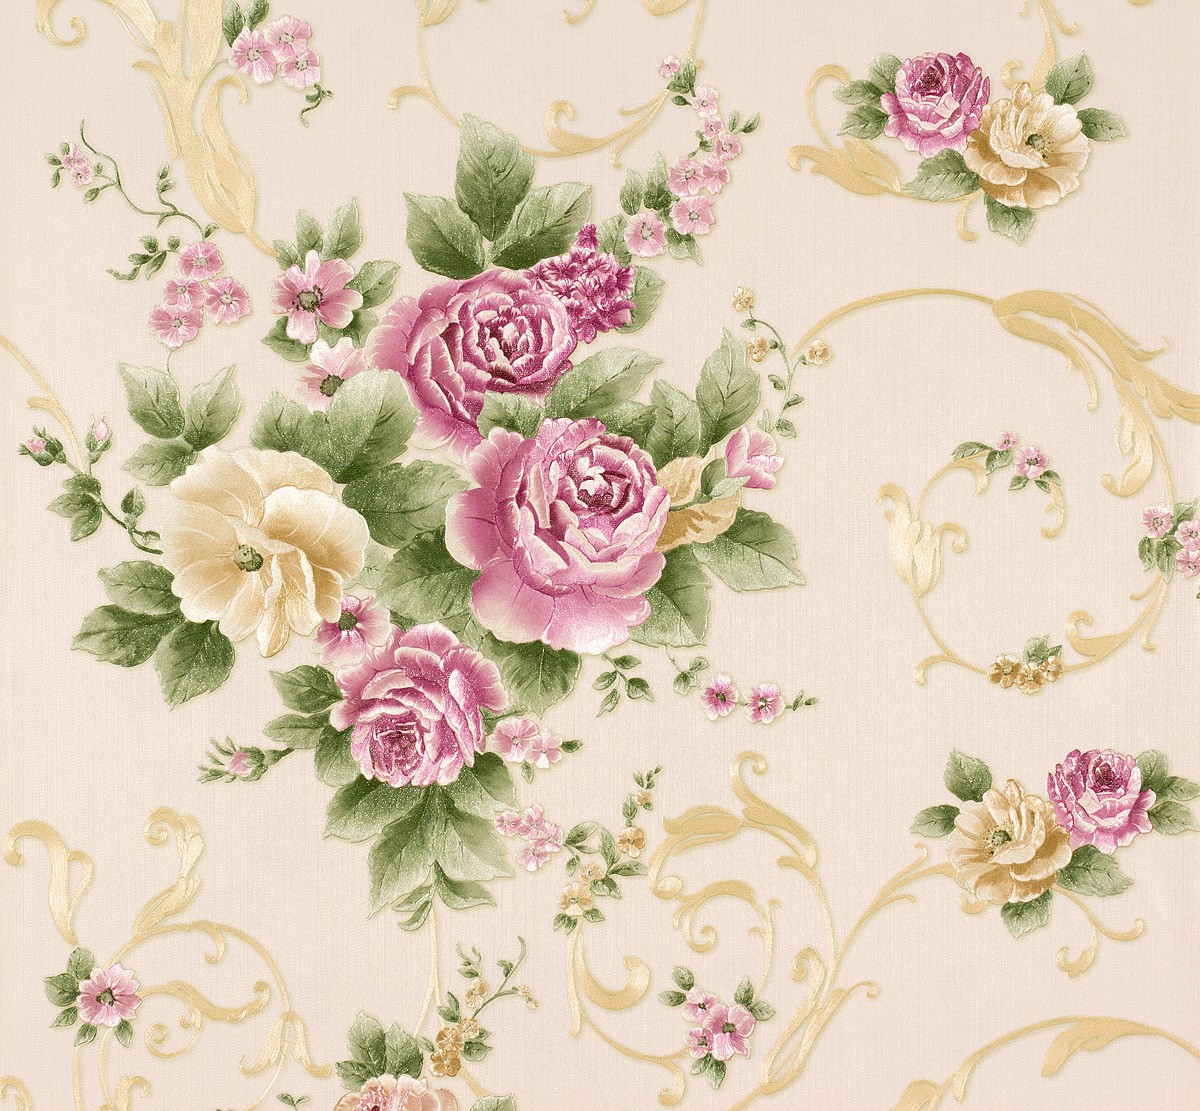 Wallpaper romantica flower beige colourful as 30647 5 - Tapete schlafzimmer beige ...